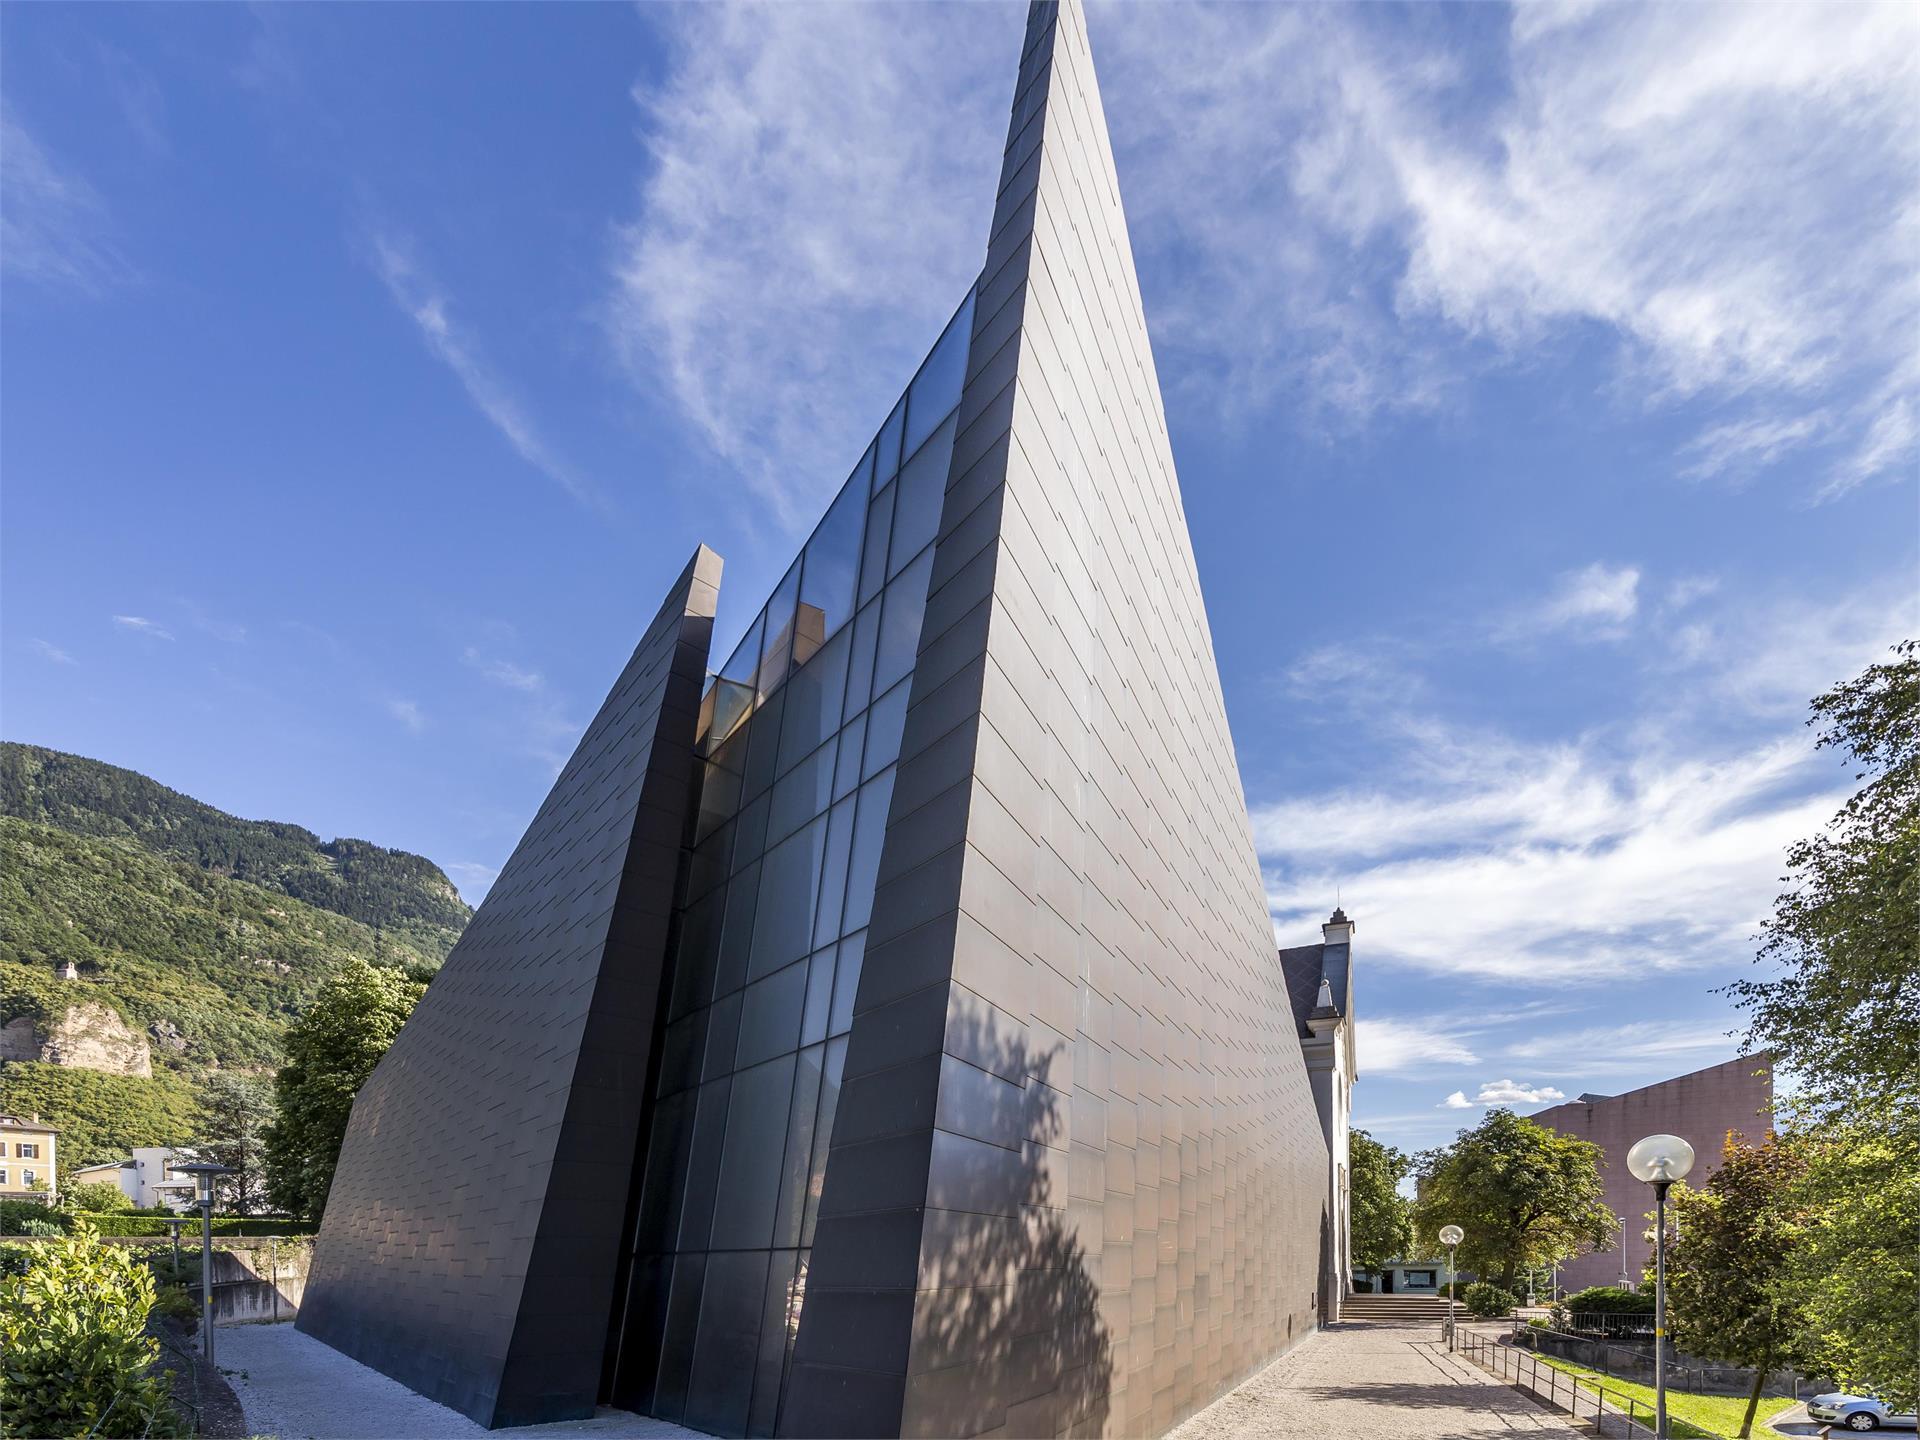 Parich church of St. Anton and Nikolaus